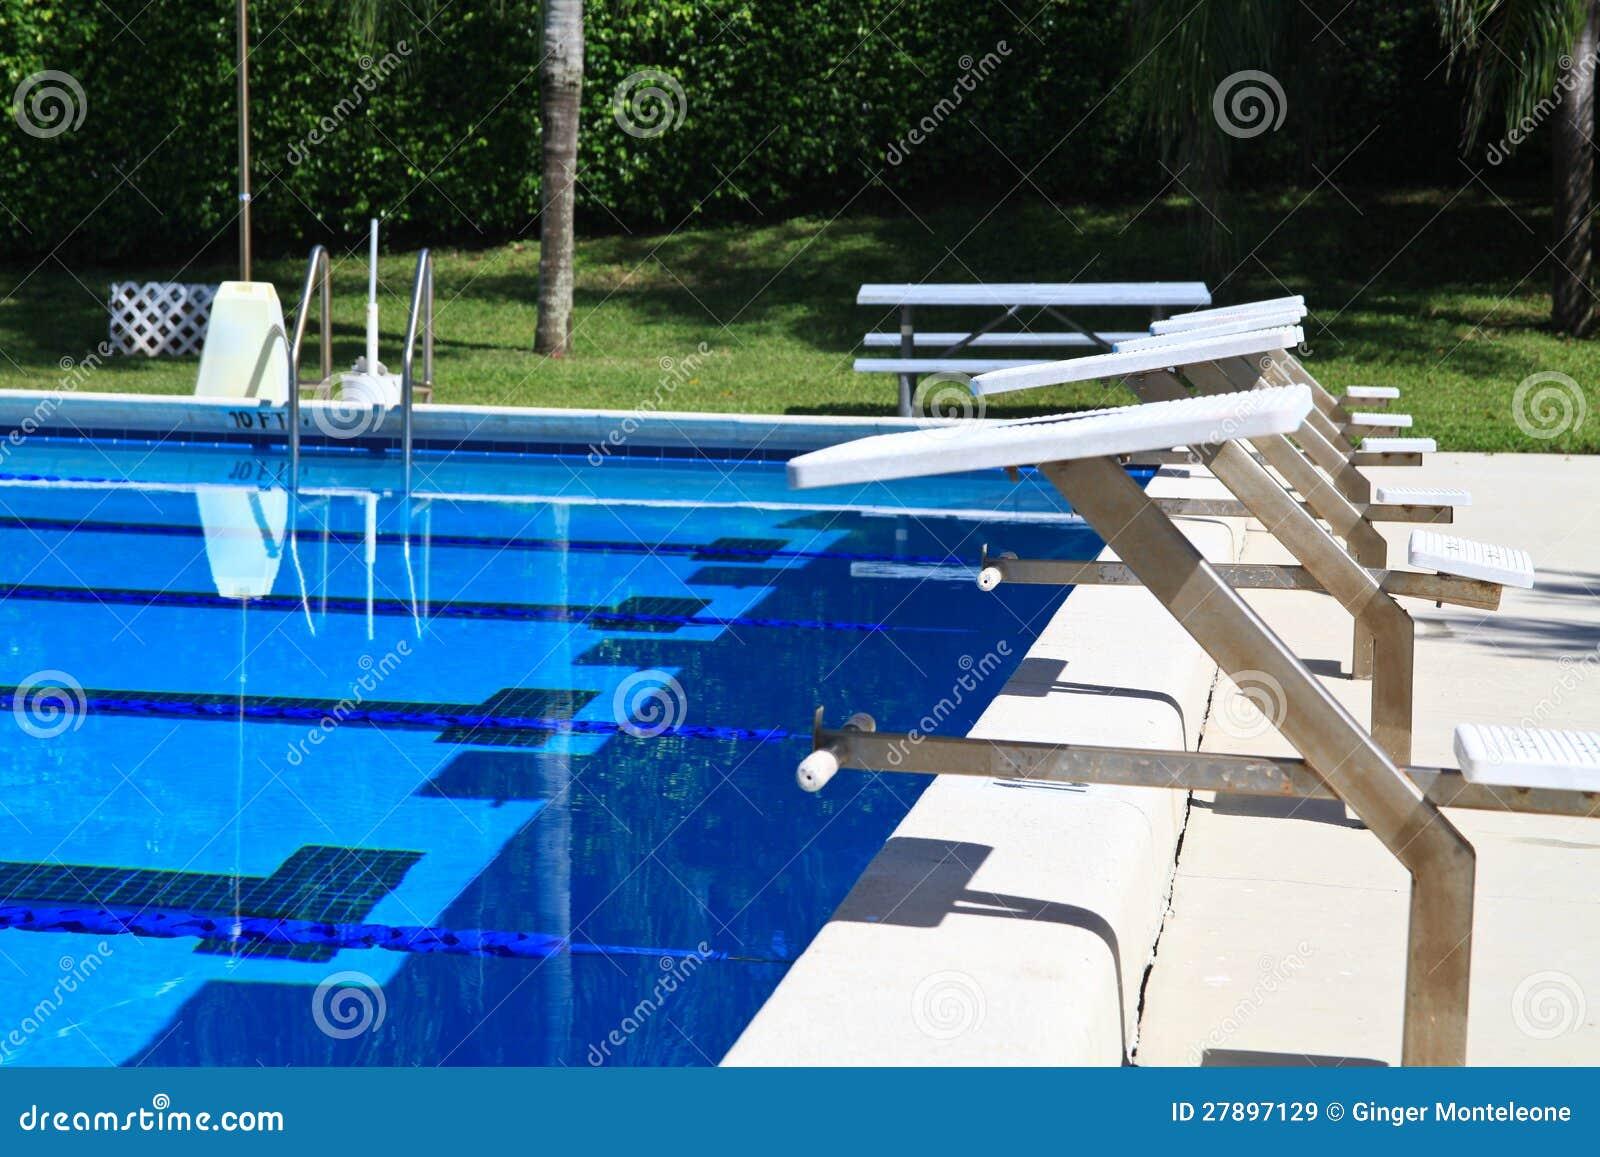 Pool Diving Platforms Royalty Free Stock Images Image 27897129